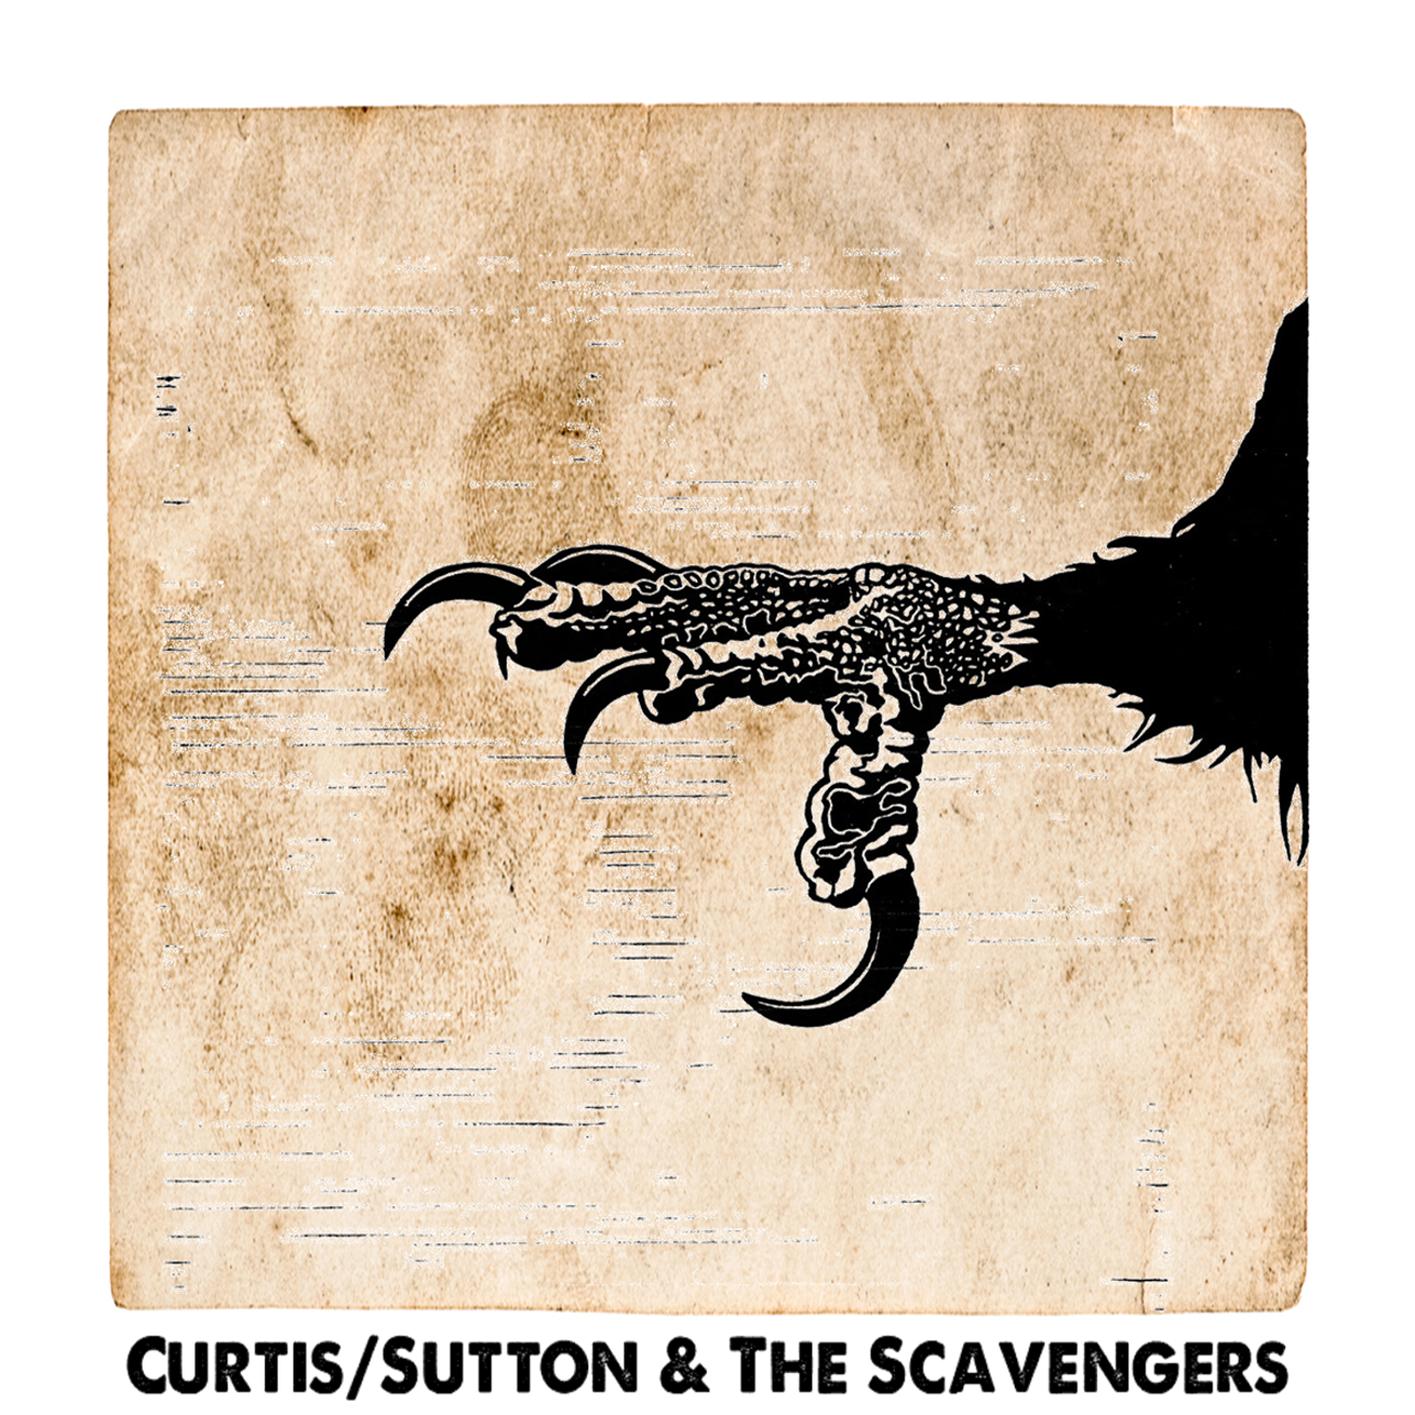 Curtis-Sutton & The Scavengers - Curtis-Sutton - cover